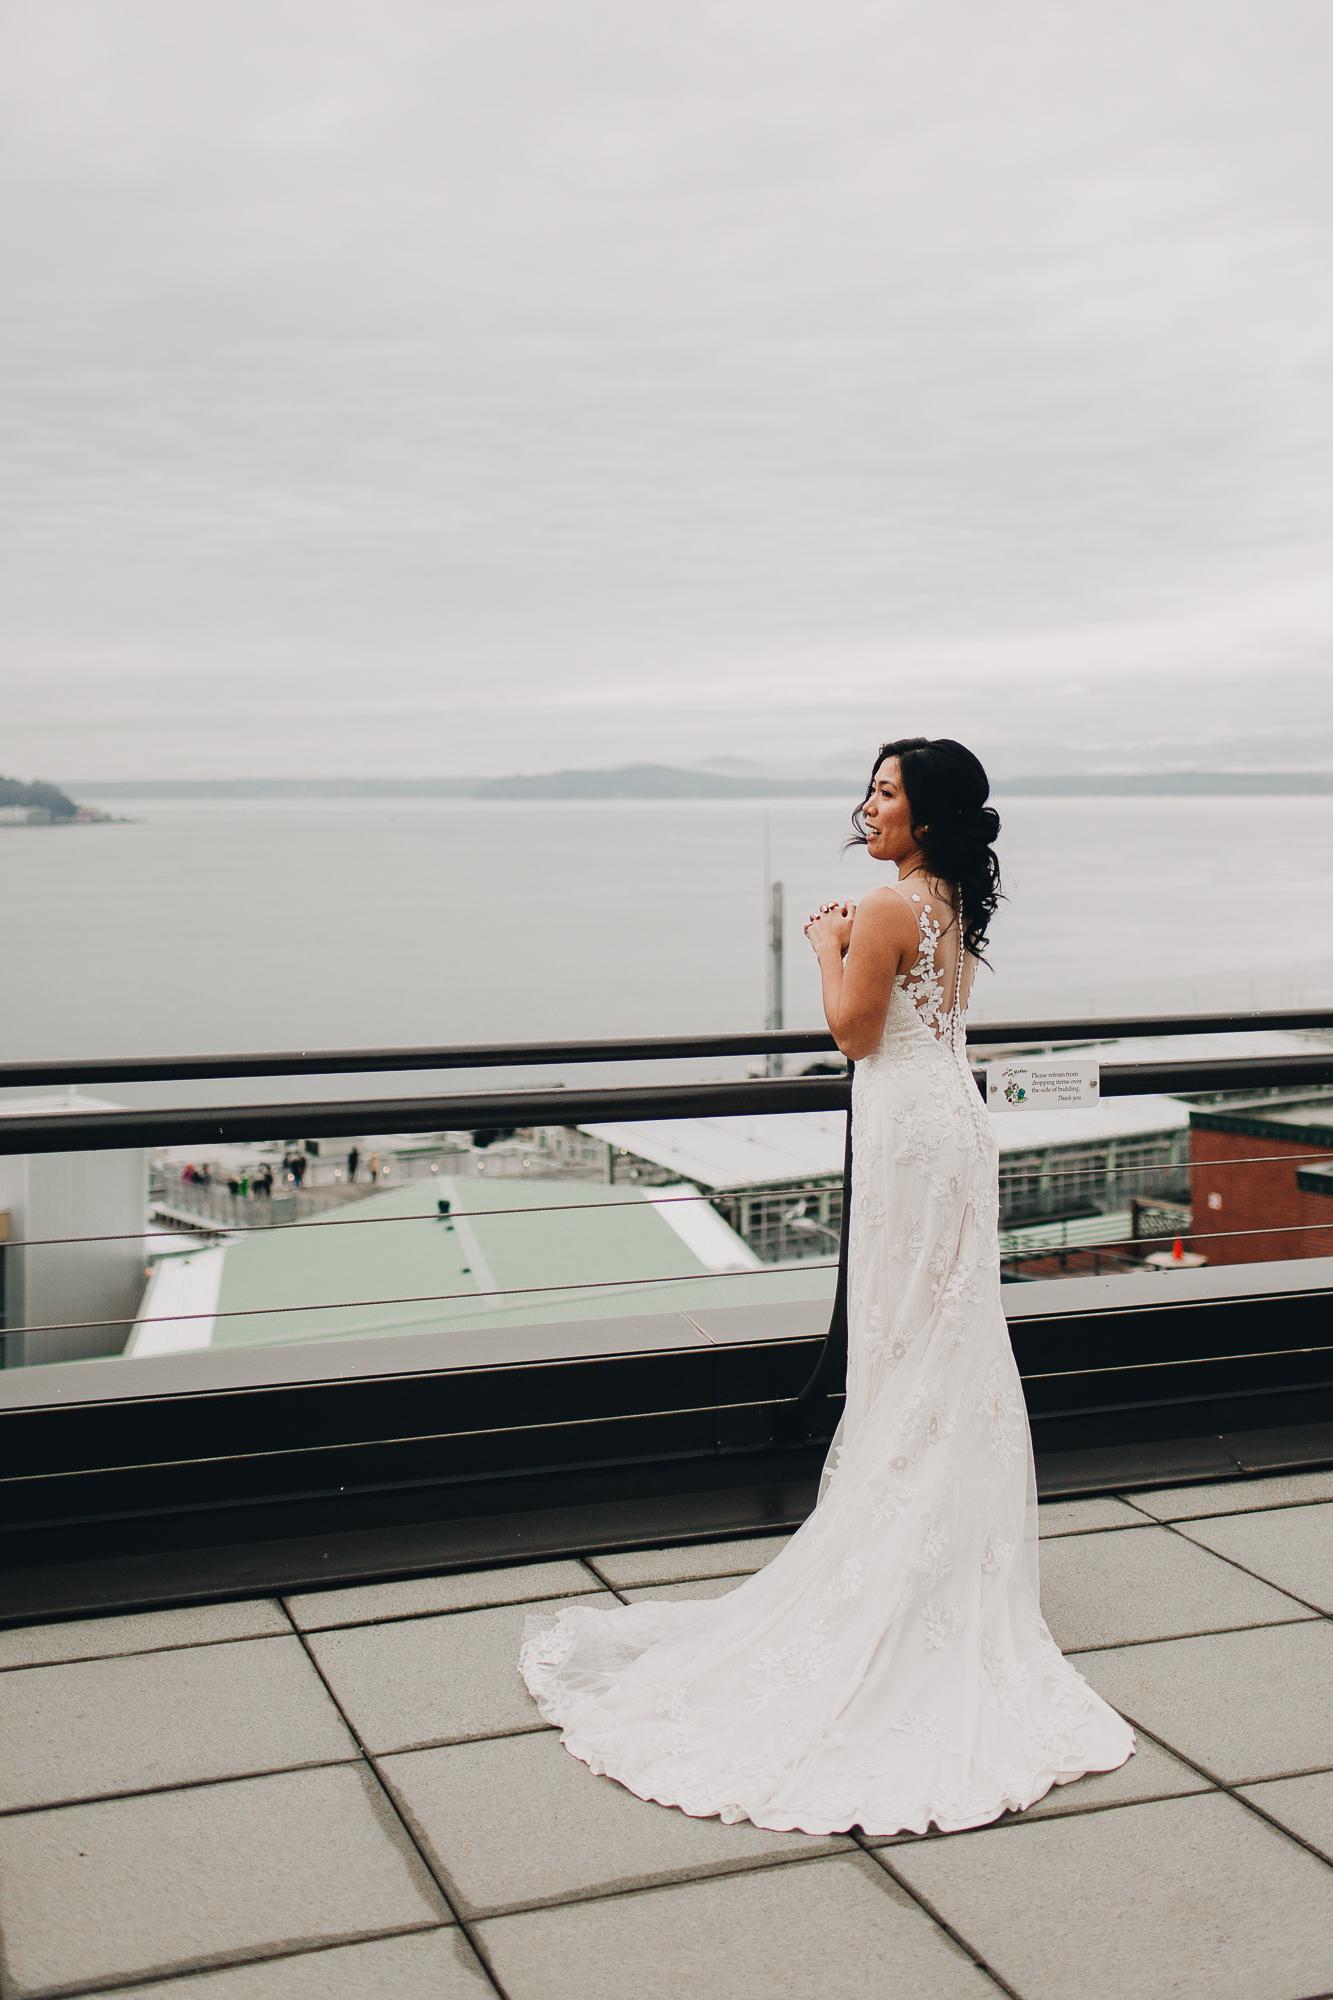 Seattle courthouse wedding photos kristawelch39.jpg